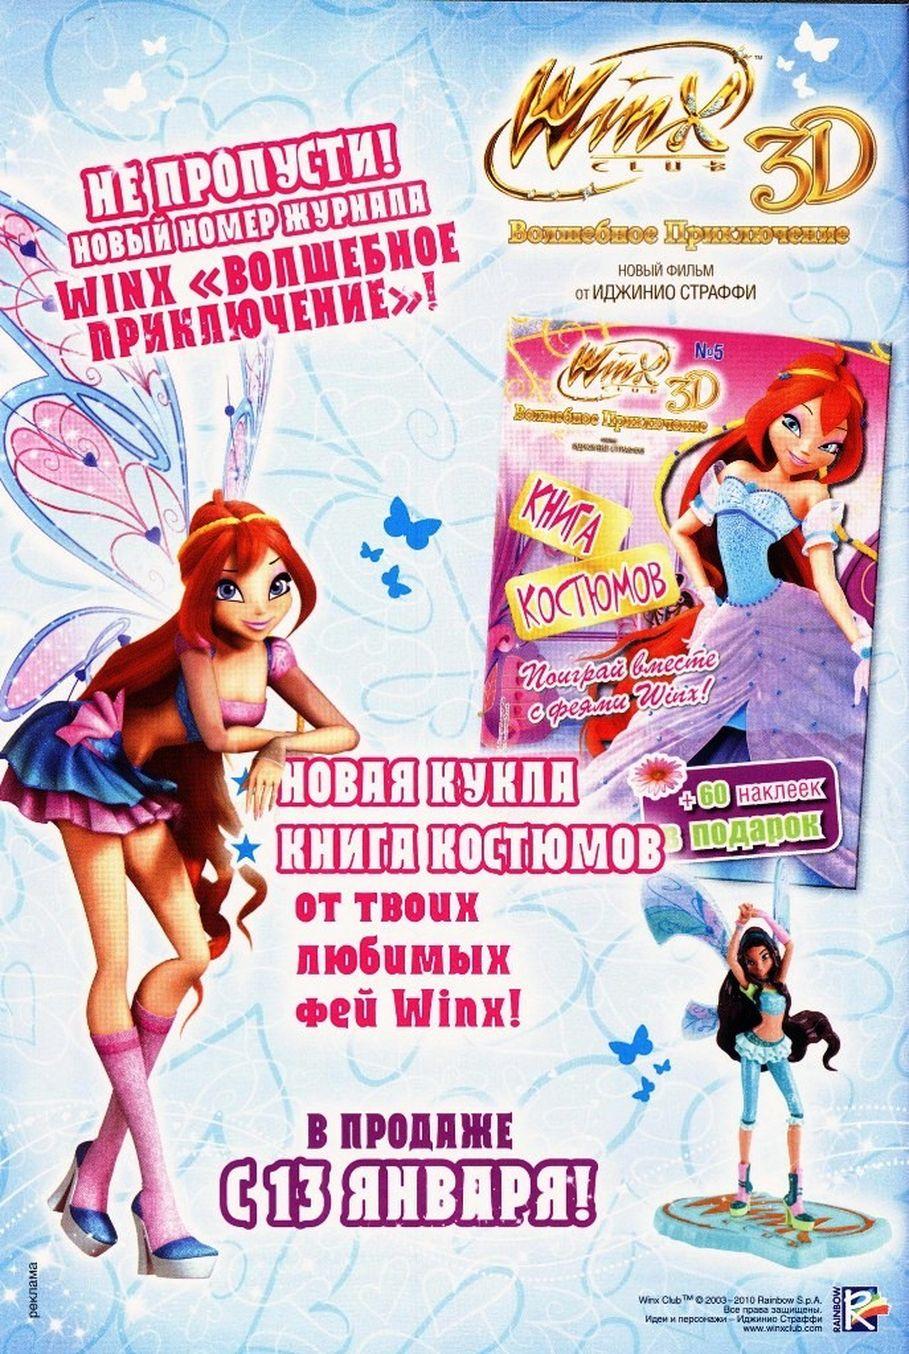 Комикс Винкс Winx - Духи и магия (Журнал Винкс №1 2011)